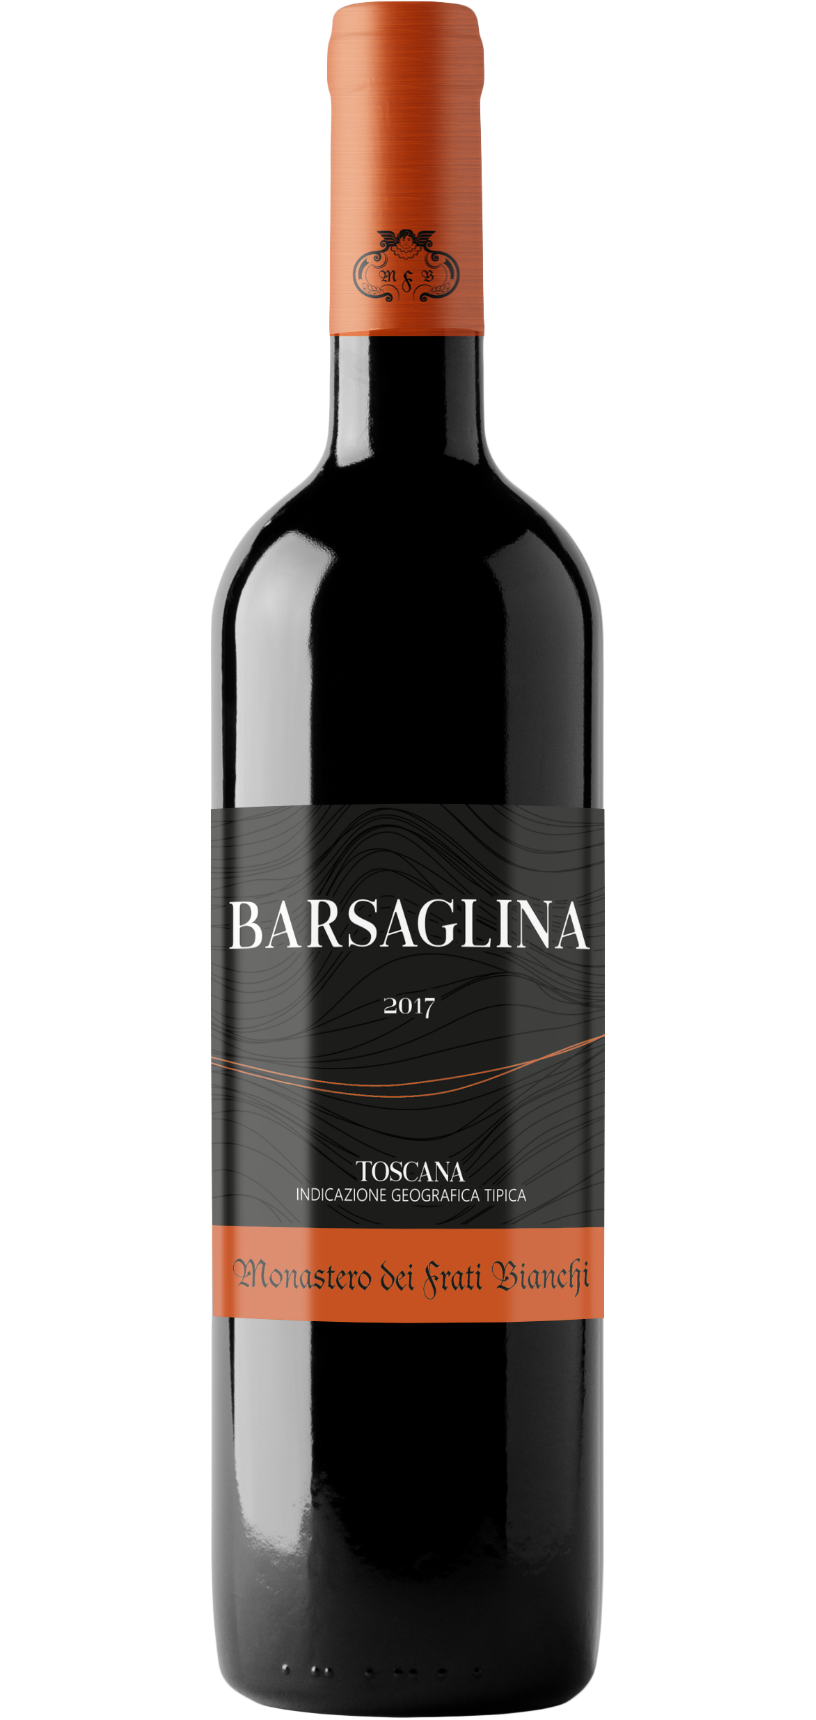 barsaglina-vino-monastero-frati-bianchi-2020@2